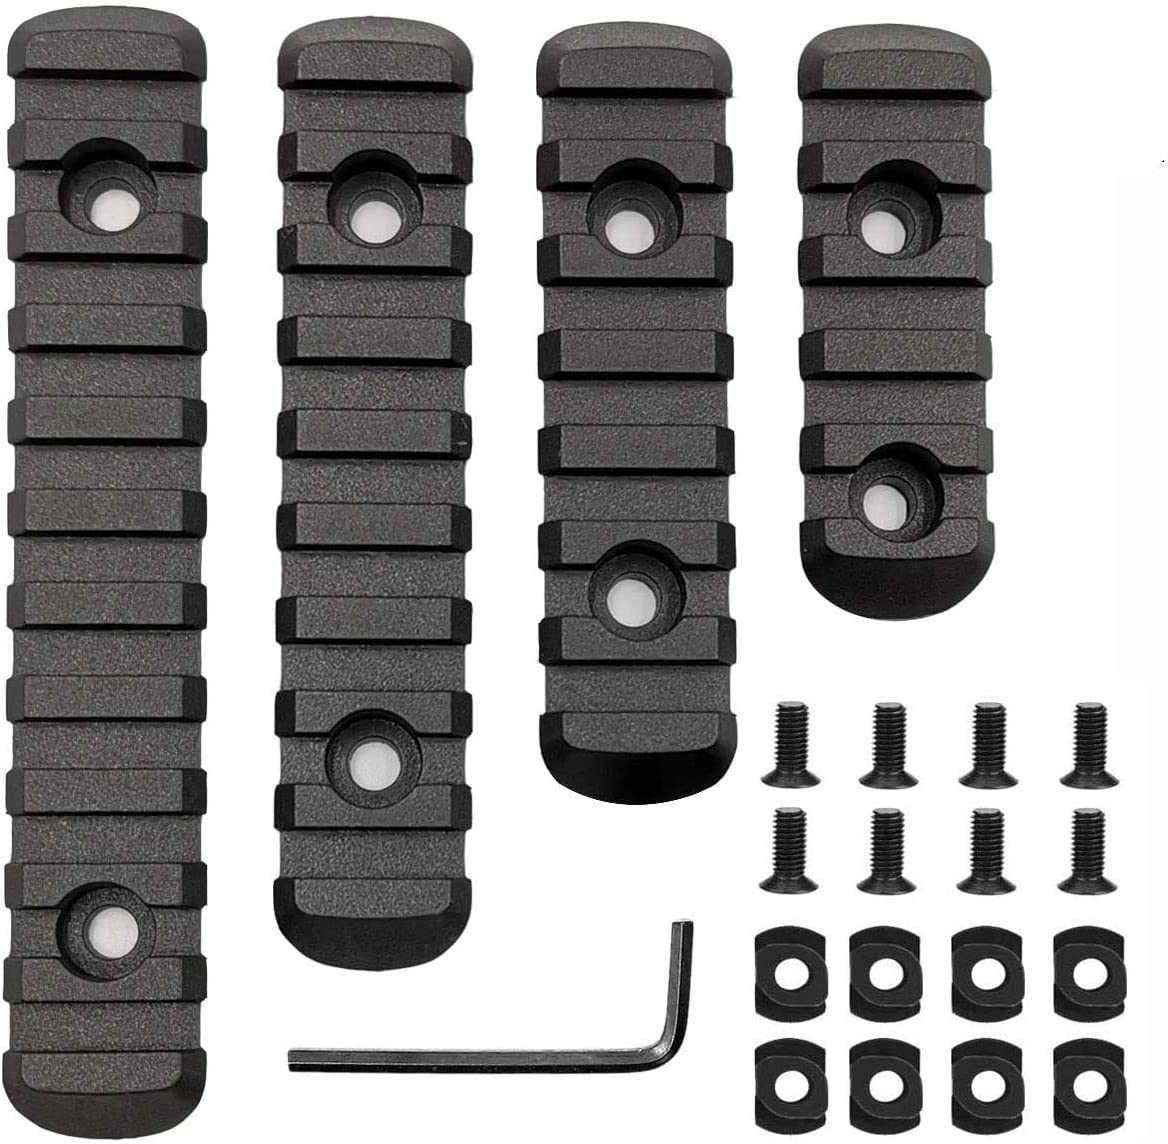 Pecawen Picatinny Rail Section Polymer 5,7,9,11 Slot Picatinny/Weaver Rail for Mloc System